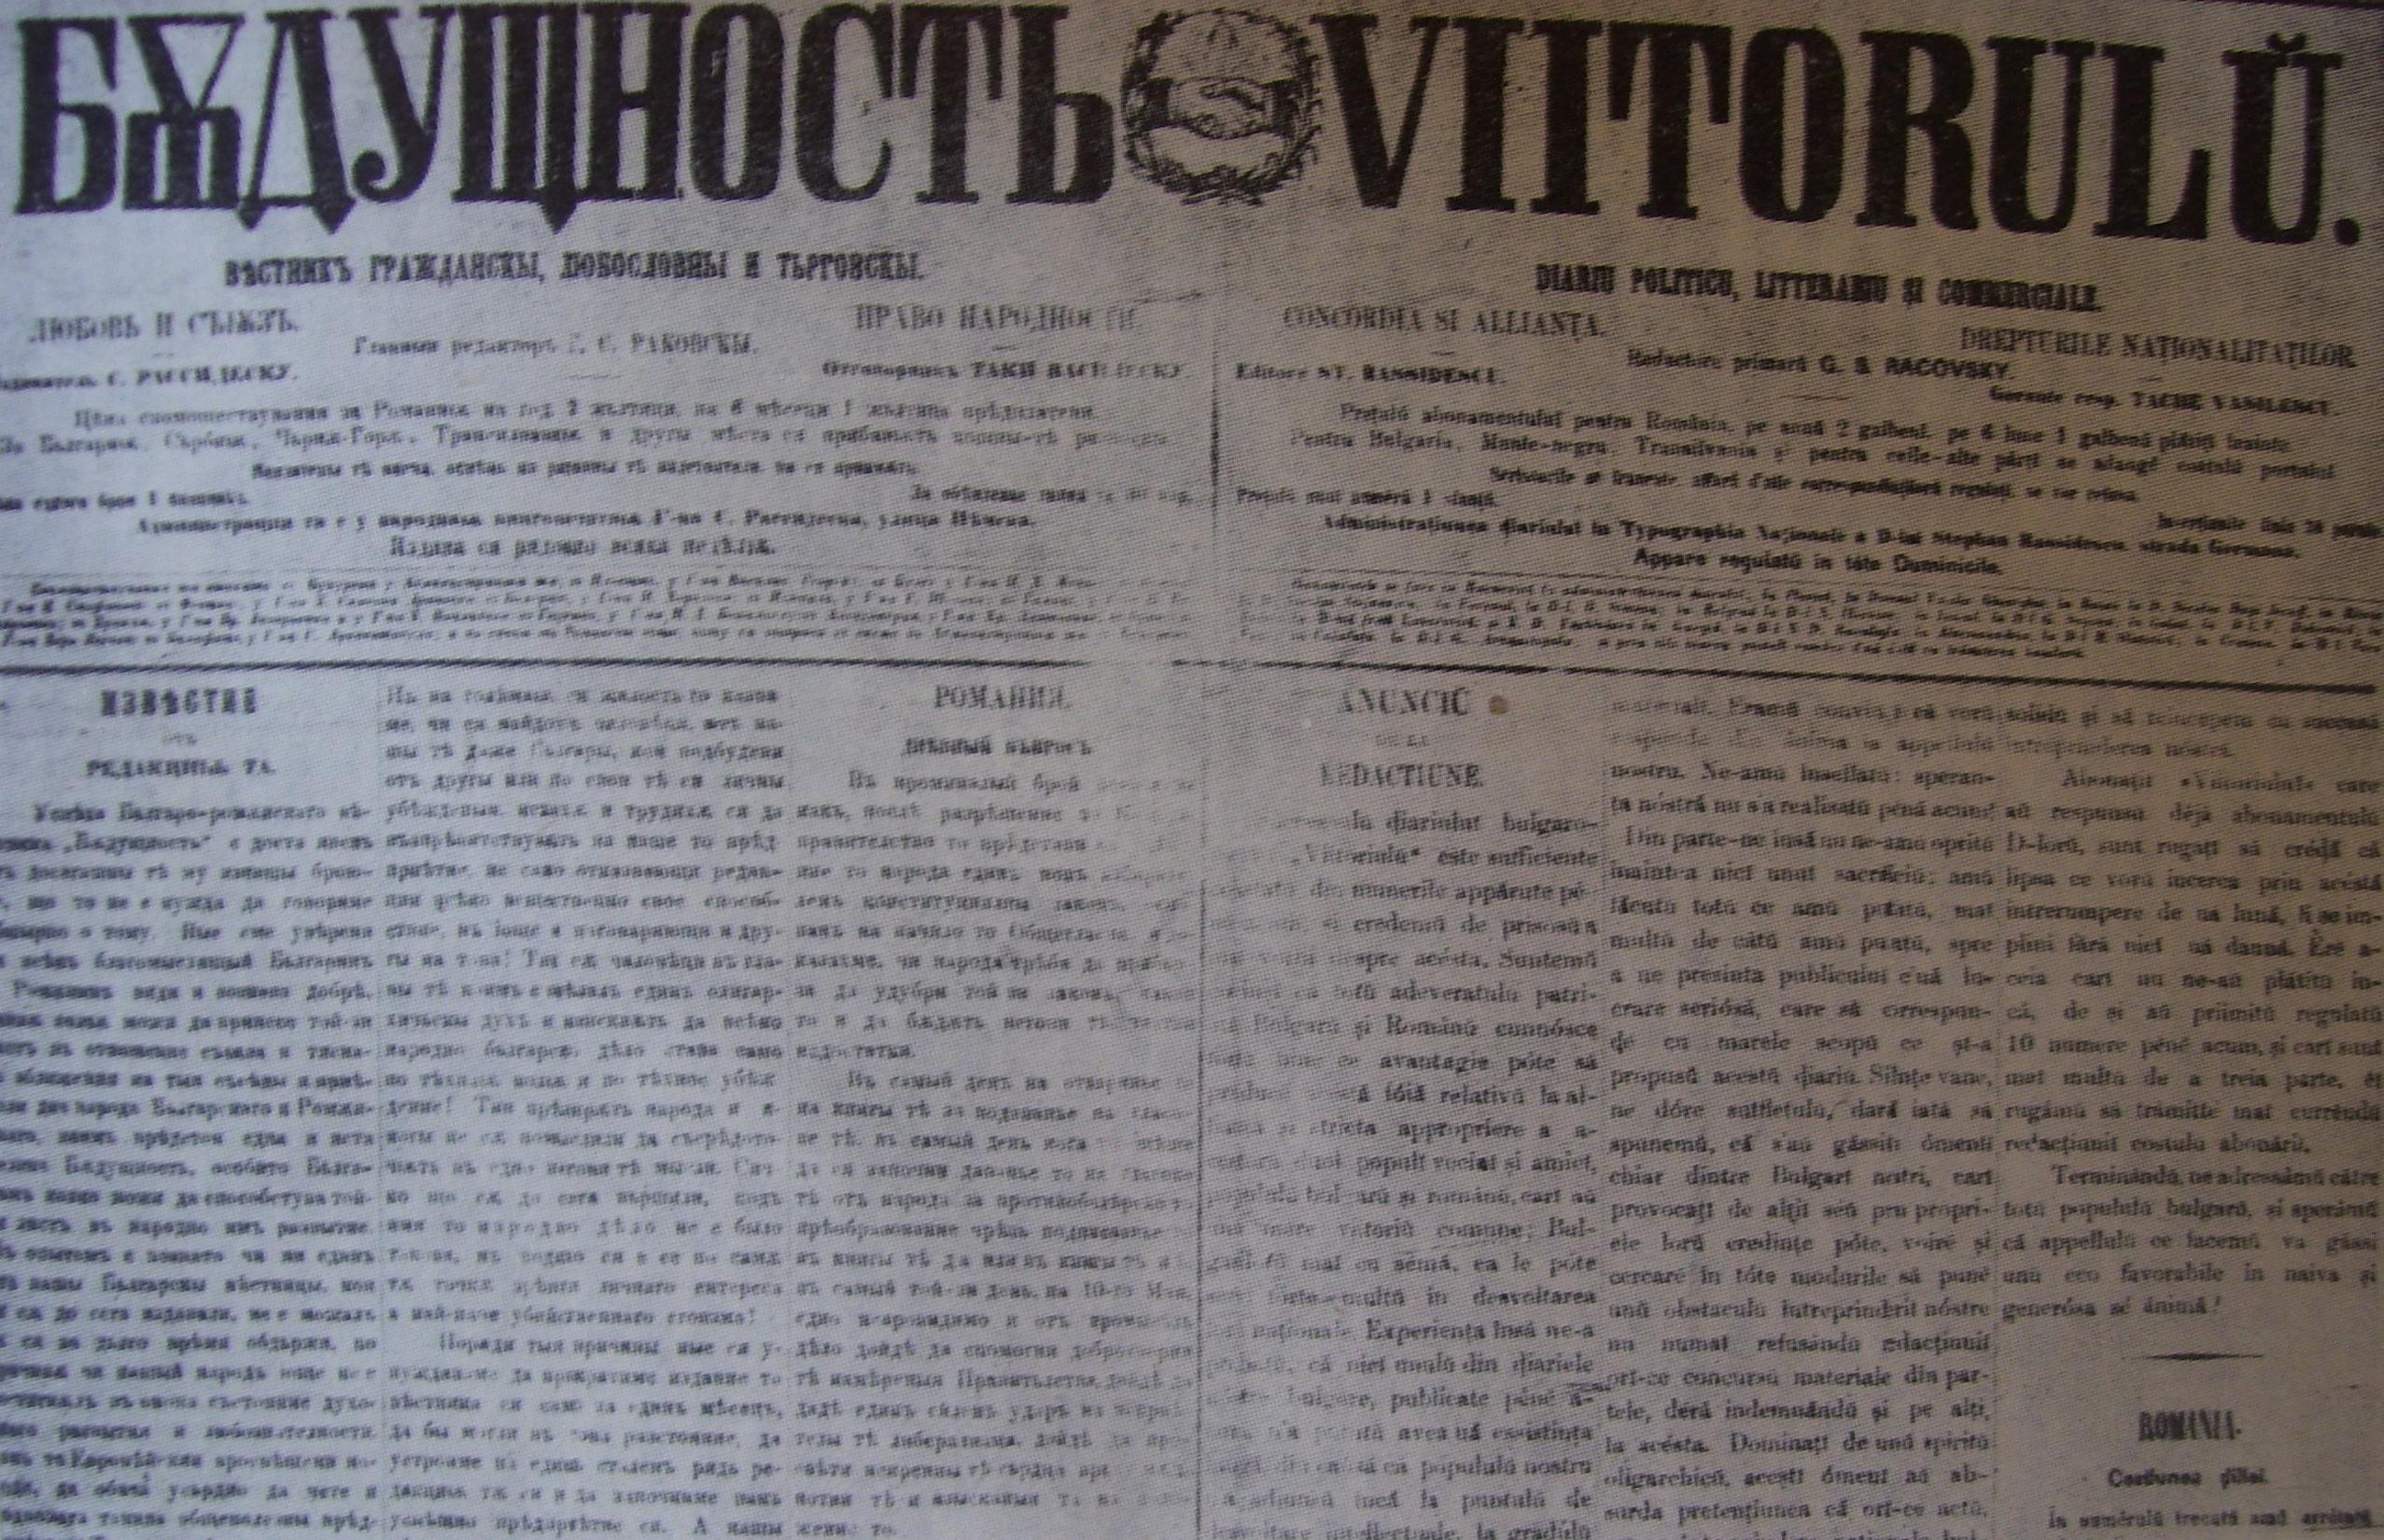 https://upload.wikimedia.org/wikipedia/commons/f/fd/Badushtnost-Issue-10.jpg